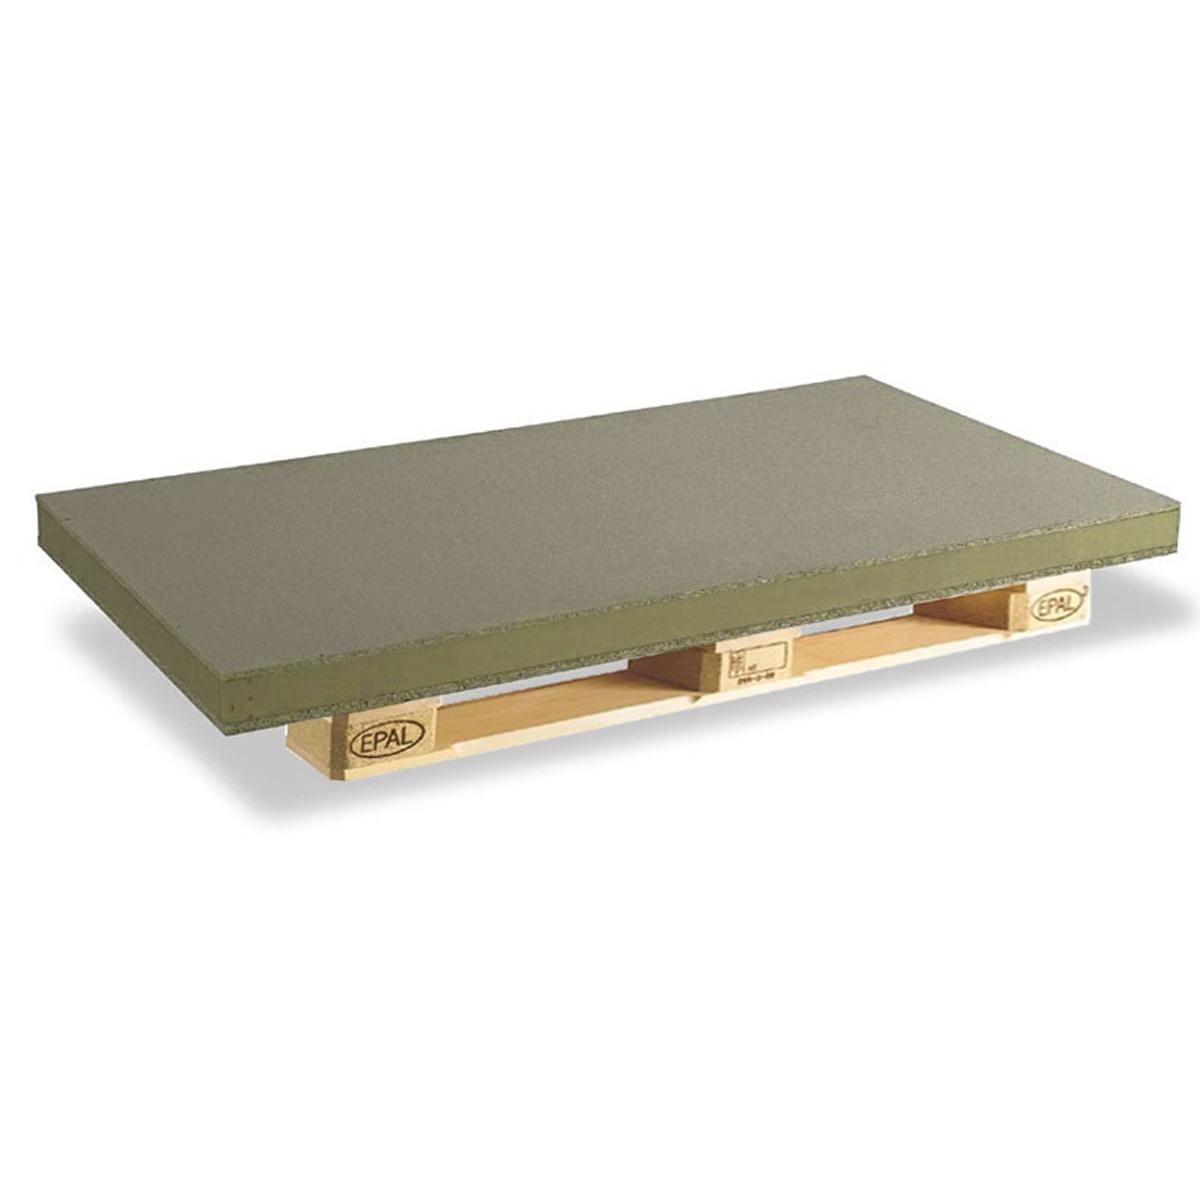 Plato de ducha rectangular 120x80 Ares Stone Nox Blanco